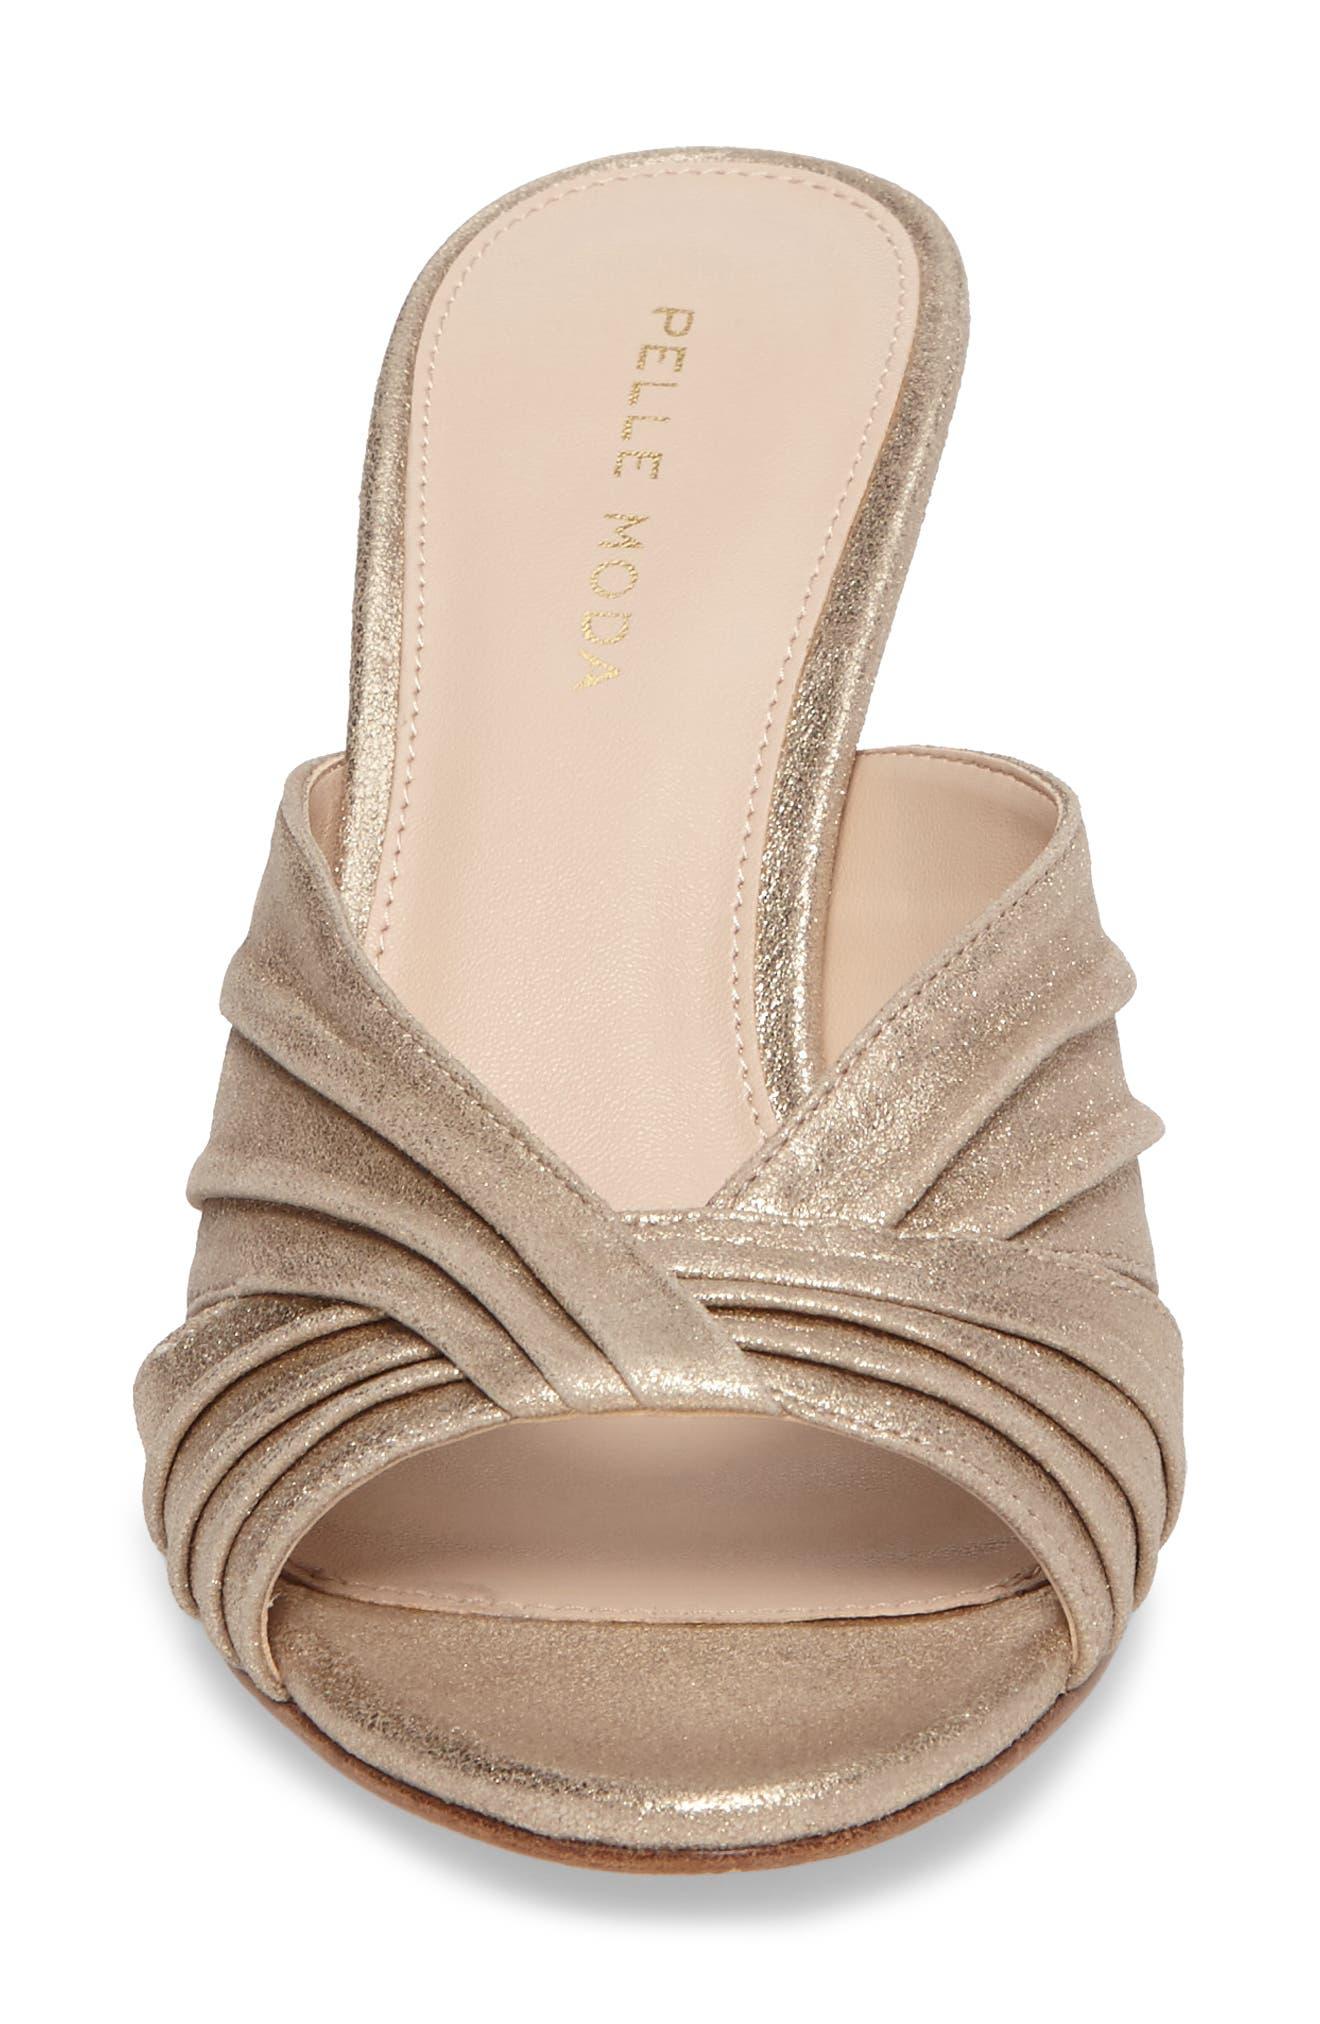 Isla Sandal,                             Alternate thumbnail 4, color,                             Platinum Gold Leather